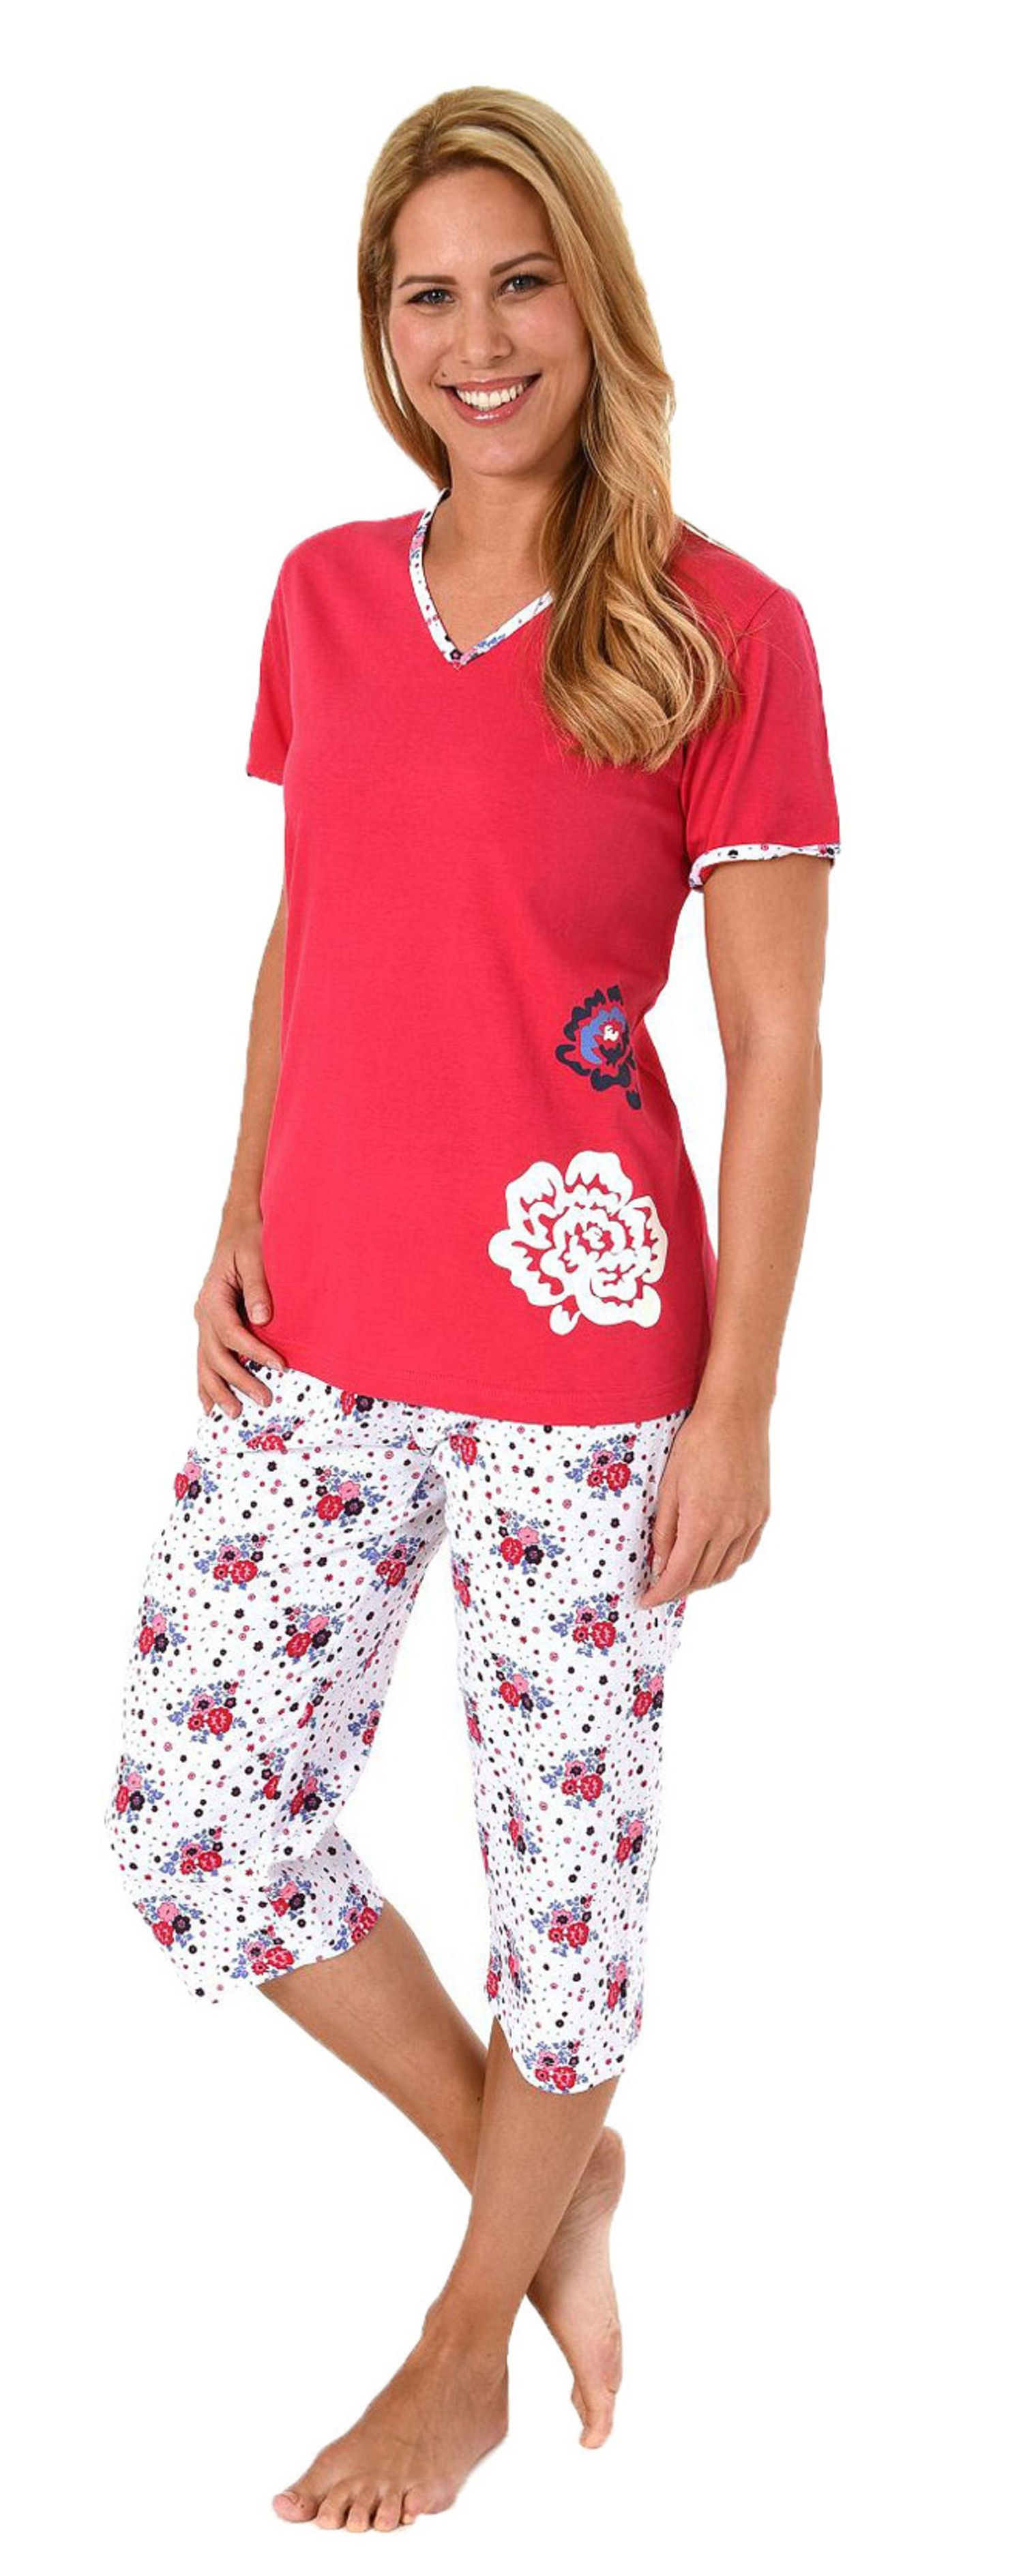 Damen Capri Pyjama kurzarm Schlafanzug mit 3/4-langer Hose, Blume als Motivprint – 60848